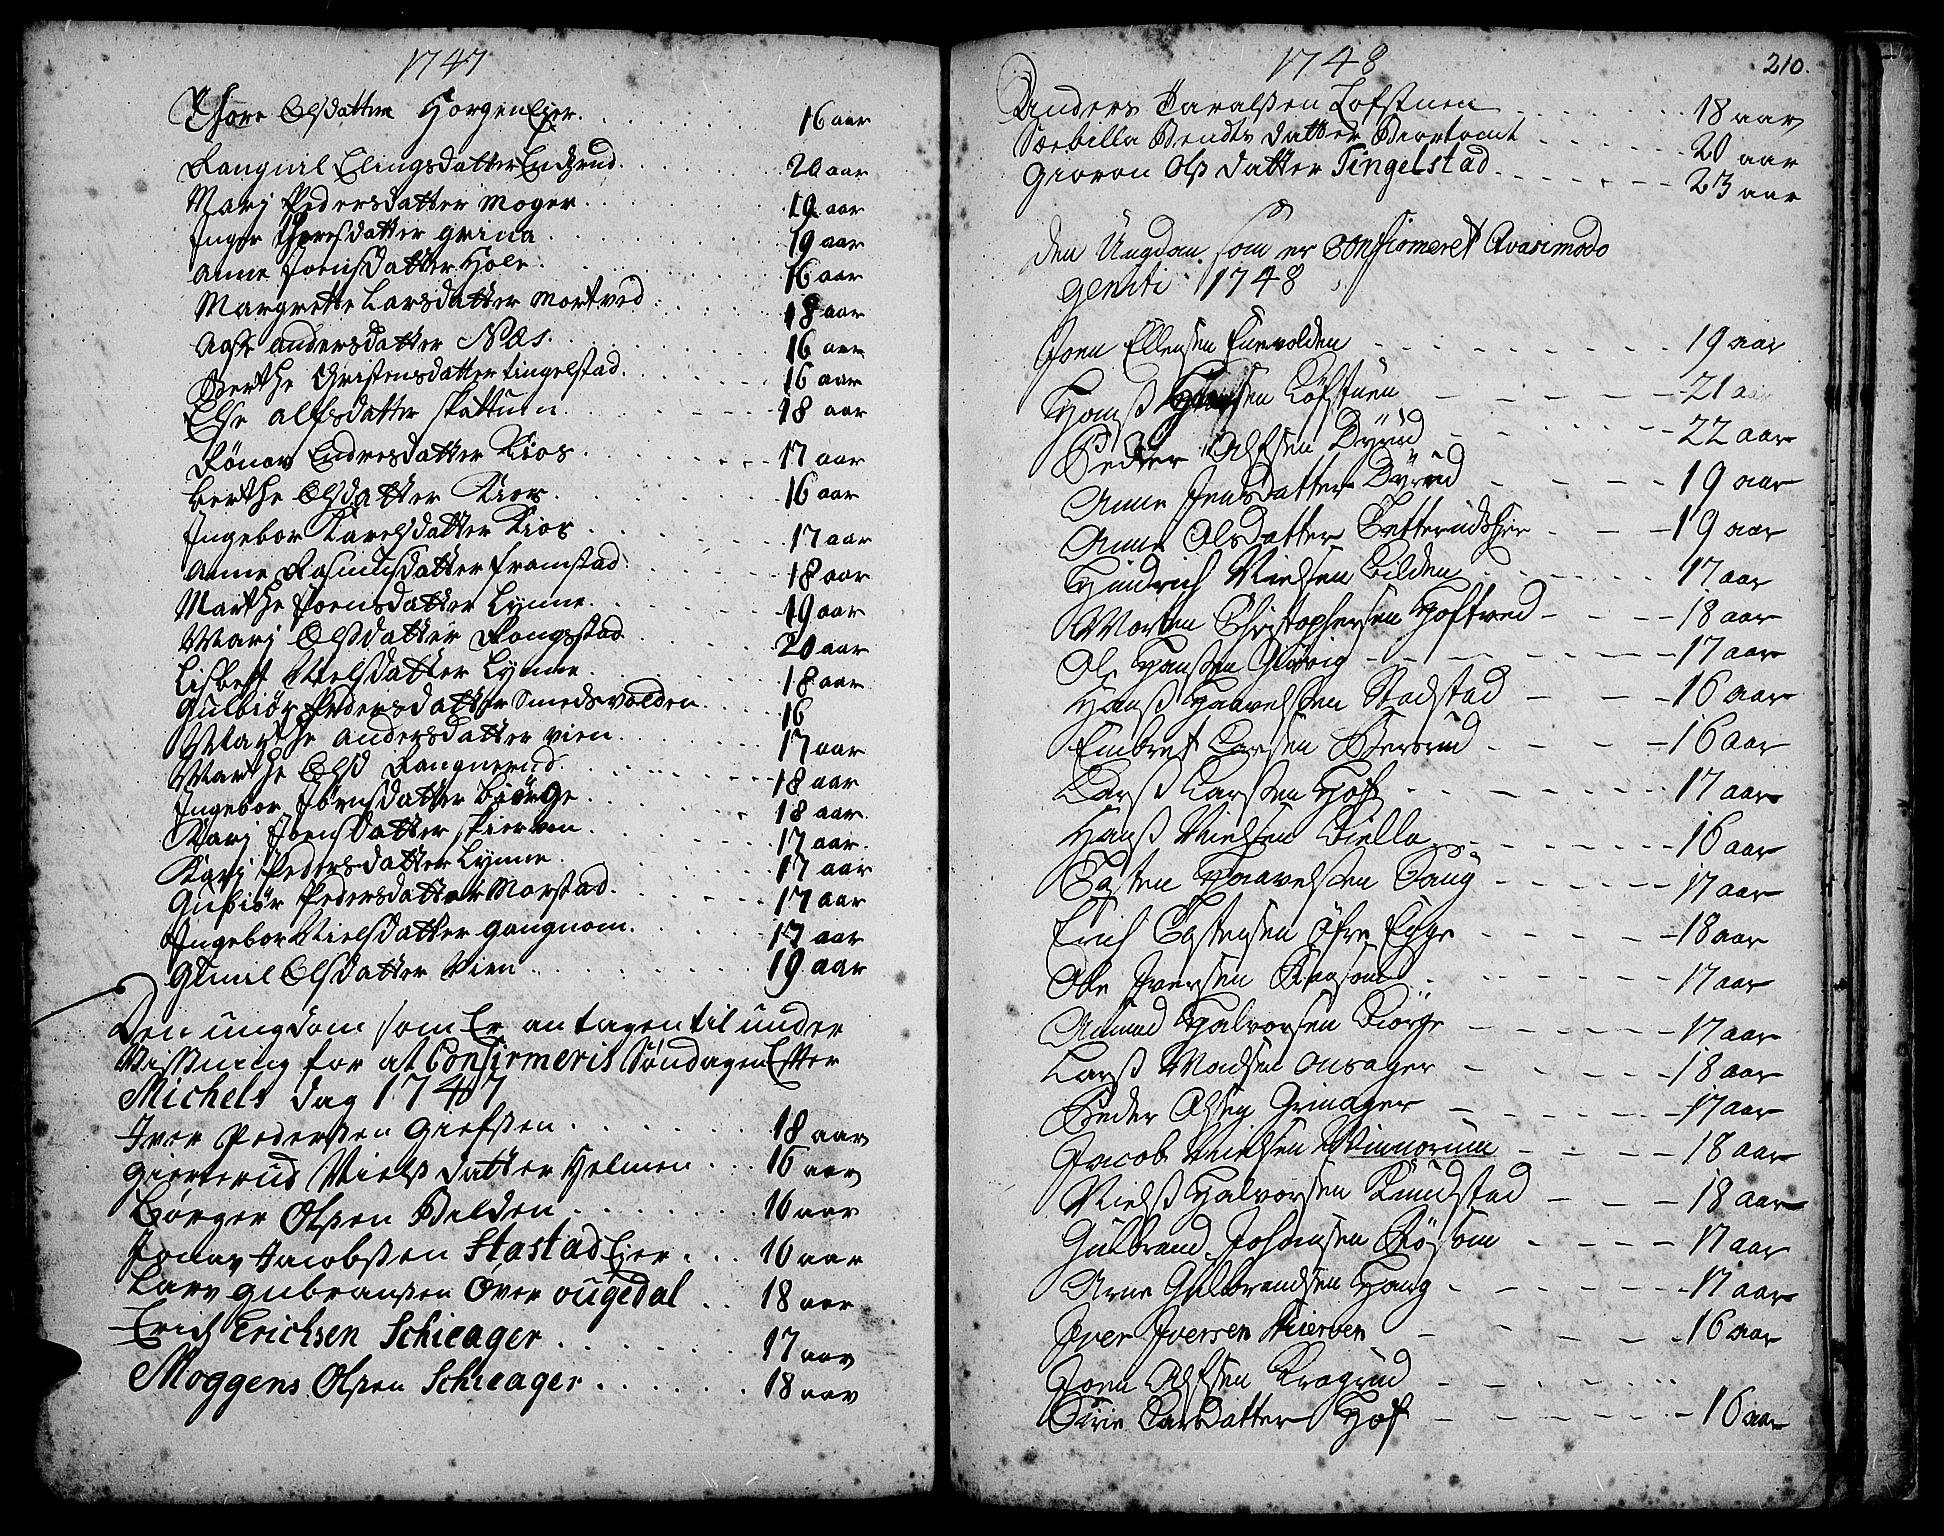 SAH, Gran prestekontor, Ministerialbok nr. 3, 1745-1758, s. 210